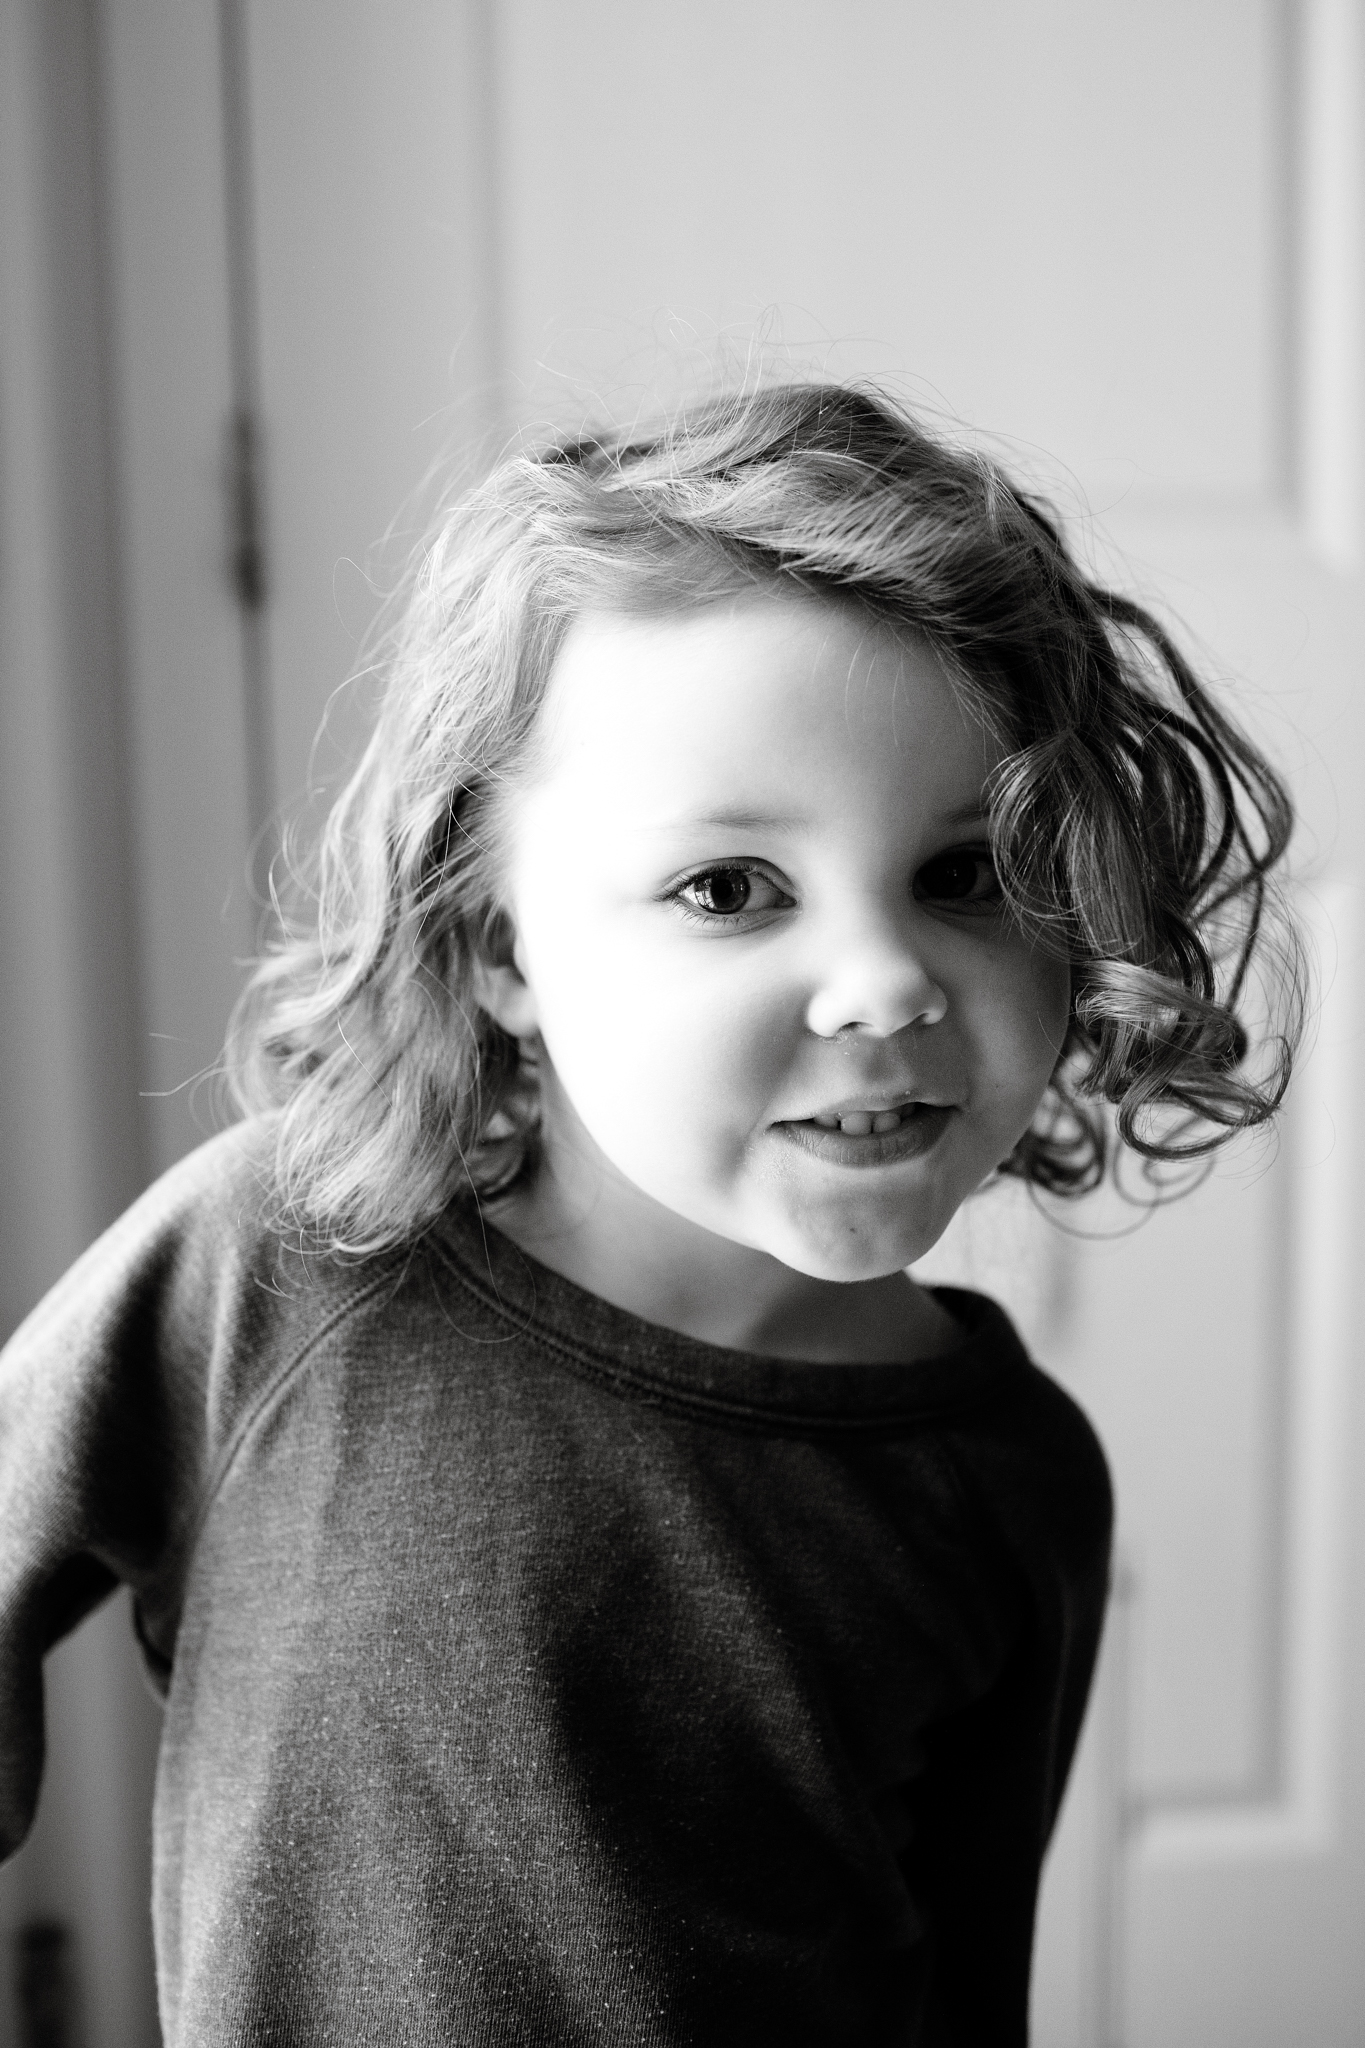 maine-winter-family-photographer-stepheneycollins-4.jpg